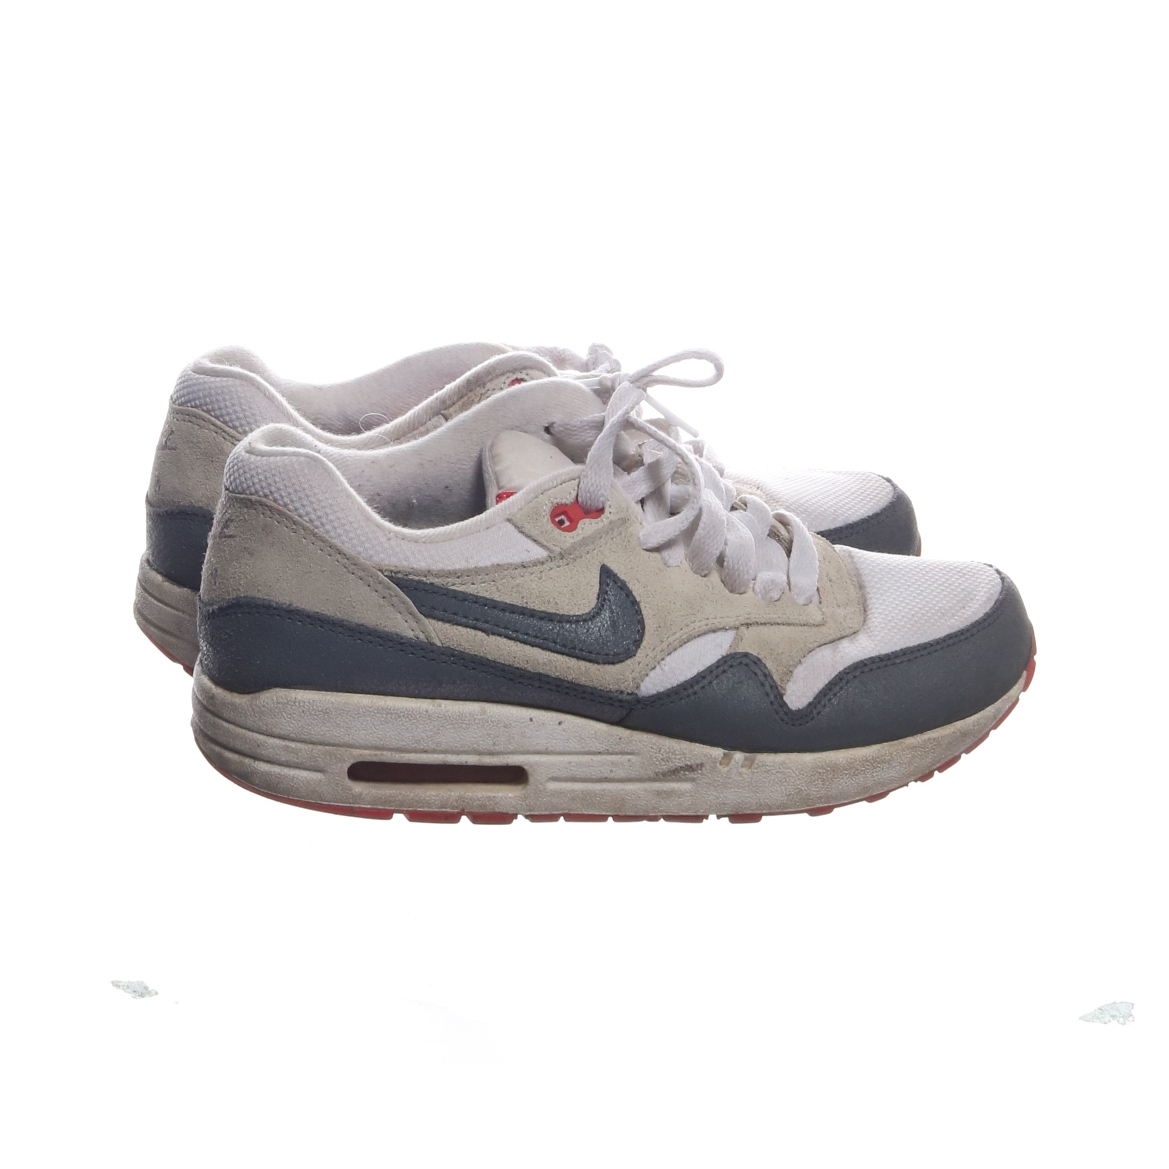 more photos 77f3e 17790 Sneakers (Vit) från Nike Air Max   Sellpy.se